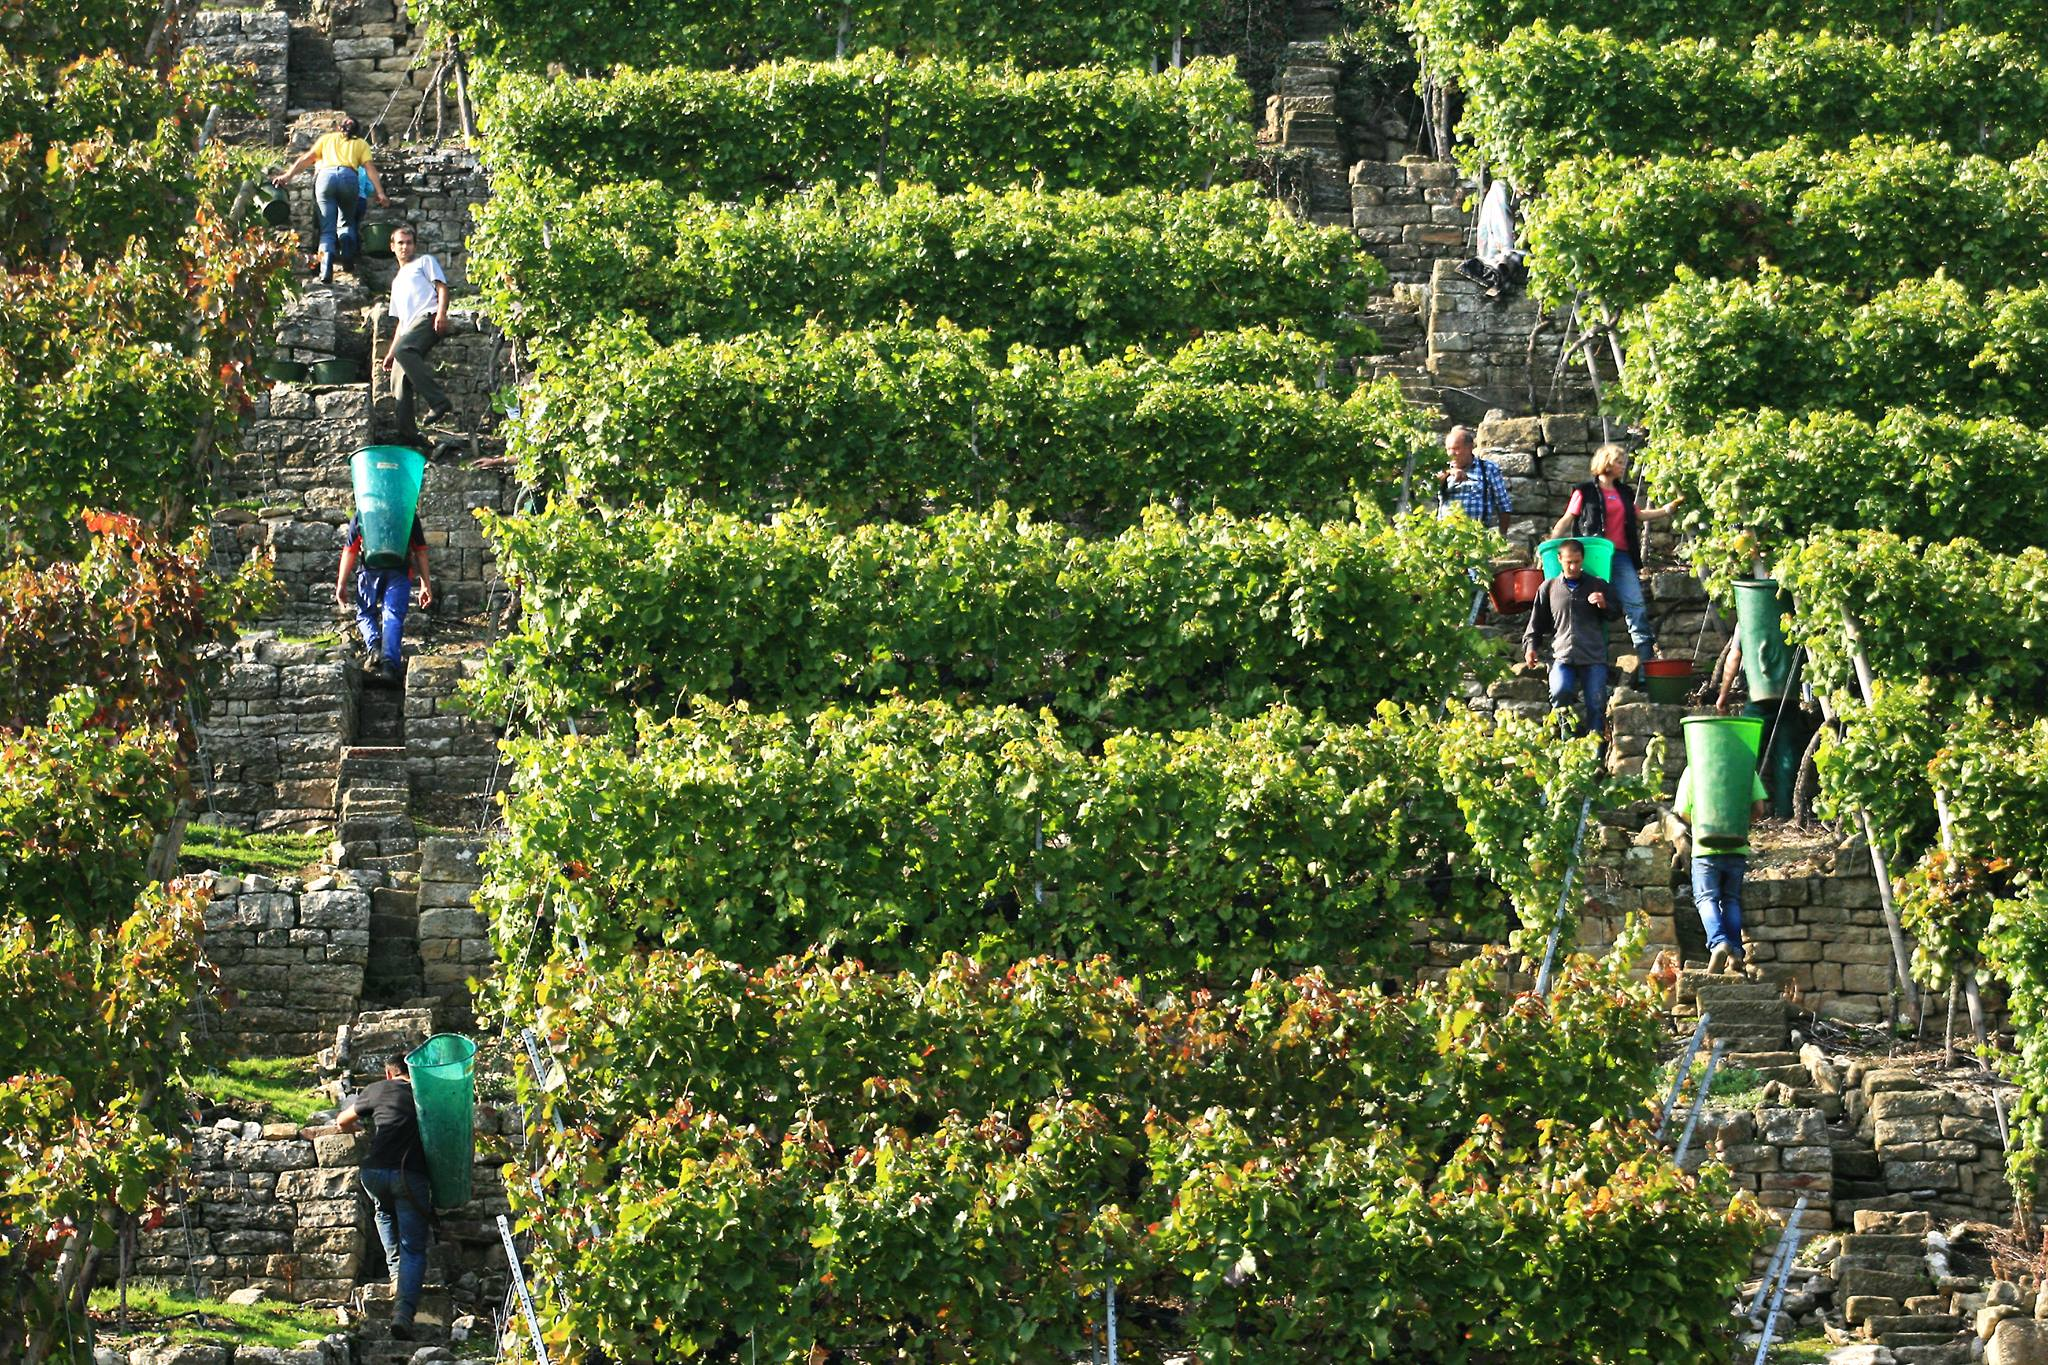 lauffener slender rows of grapevines on vineyard near winery